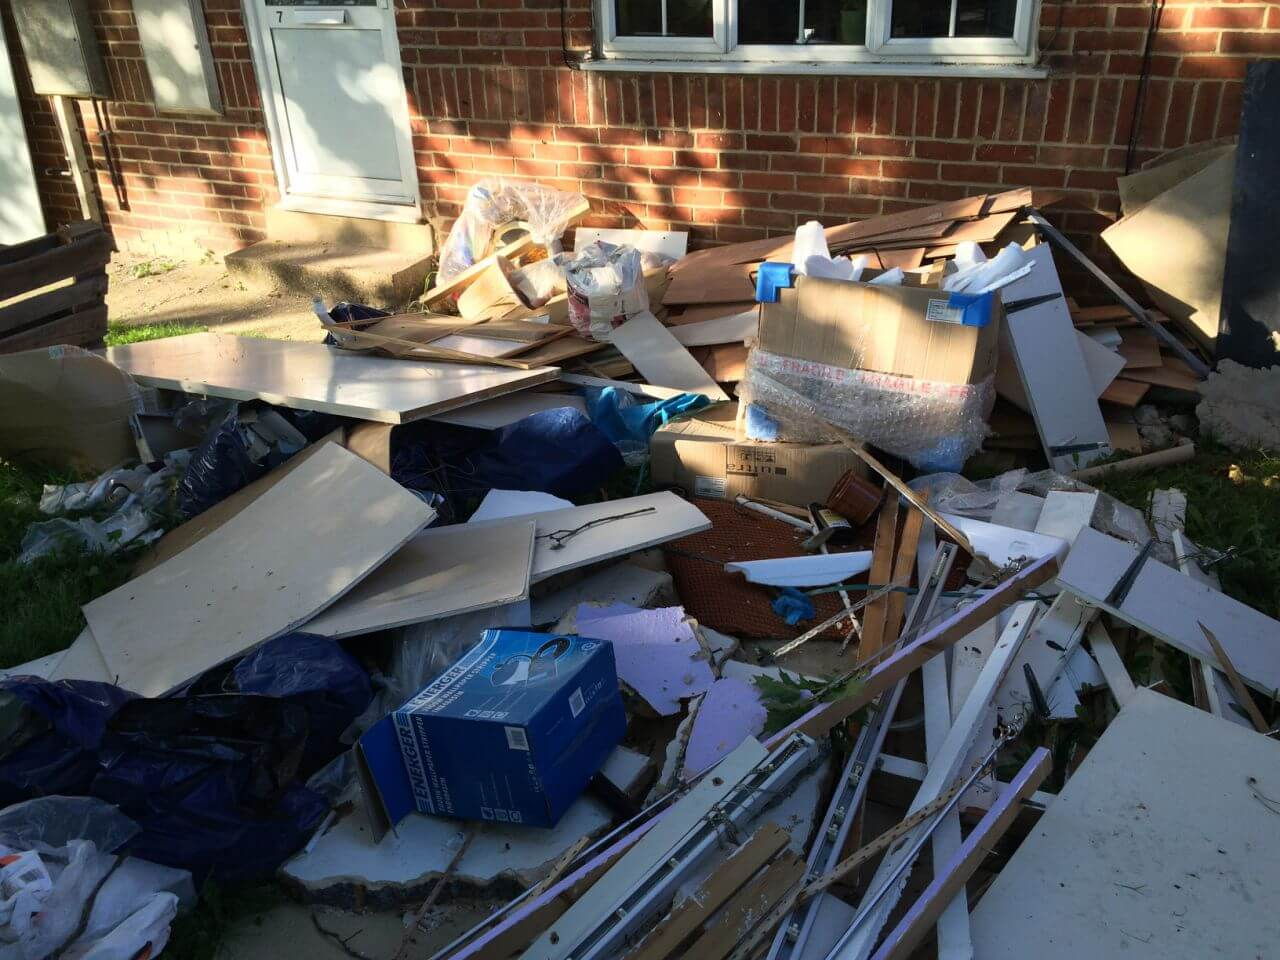 Rubbish Clearance in Ravenscourt Park